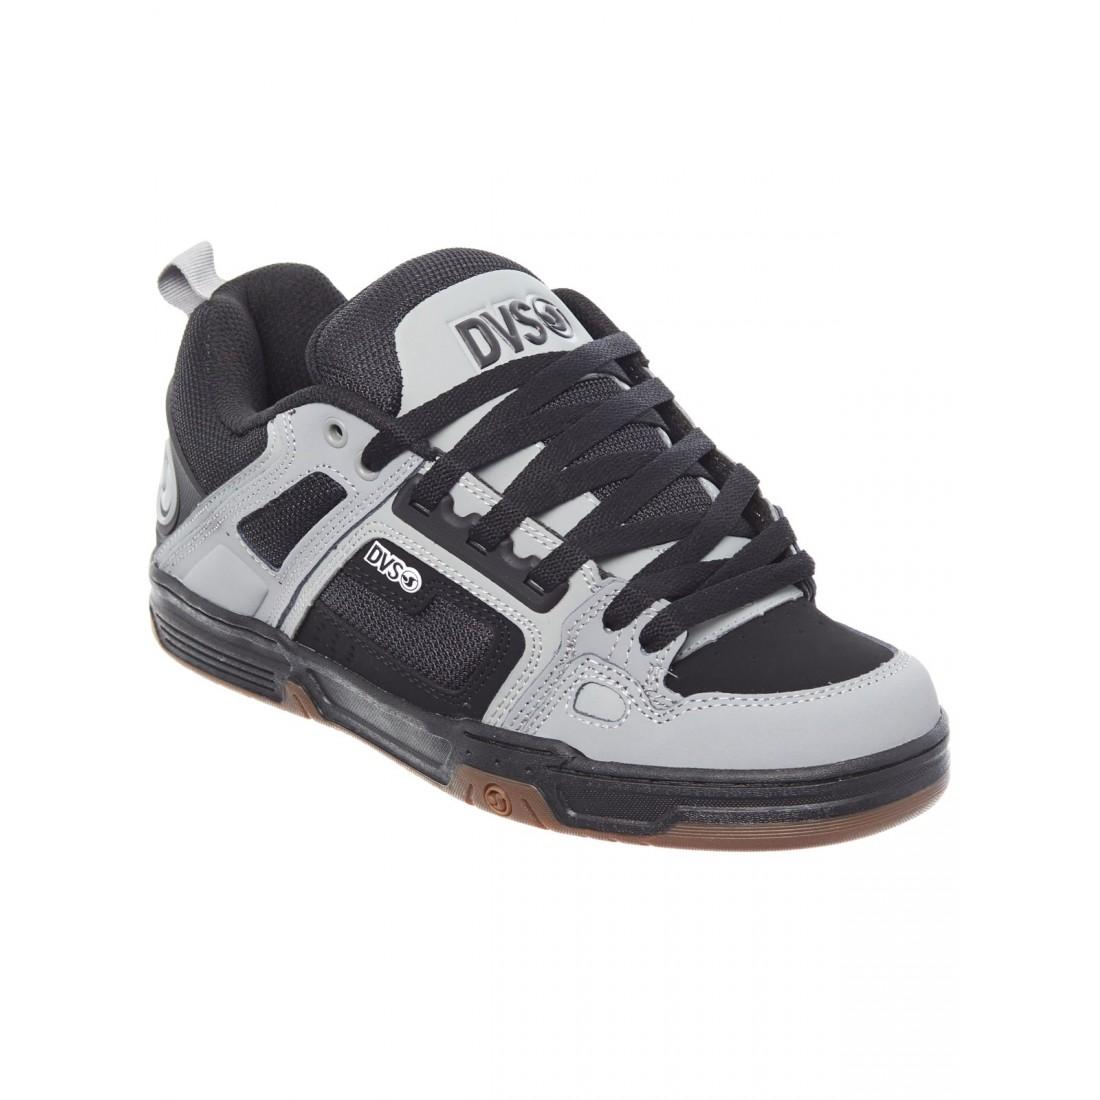 COMANCHE black grey leather